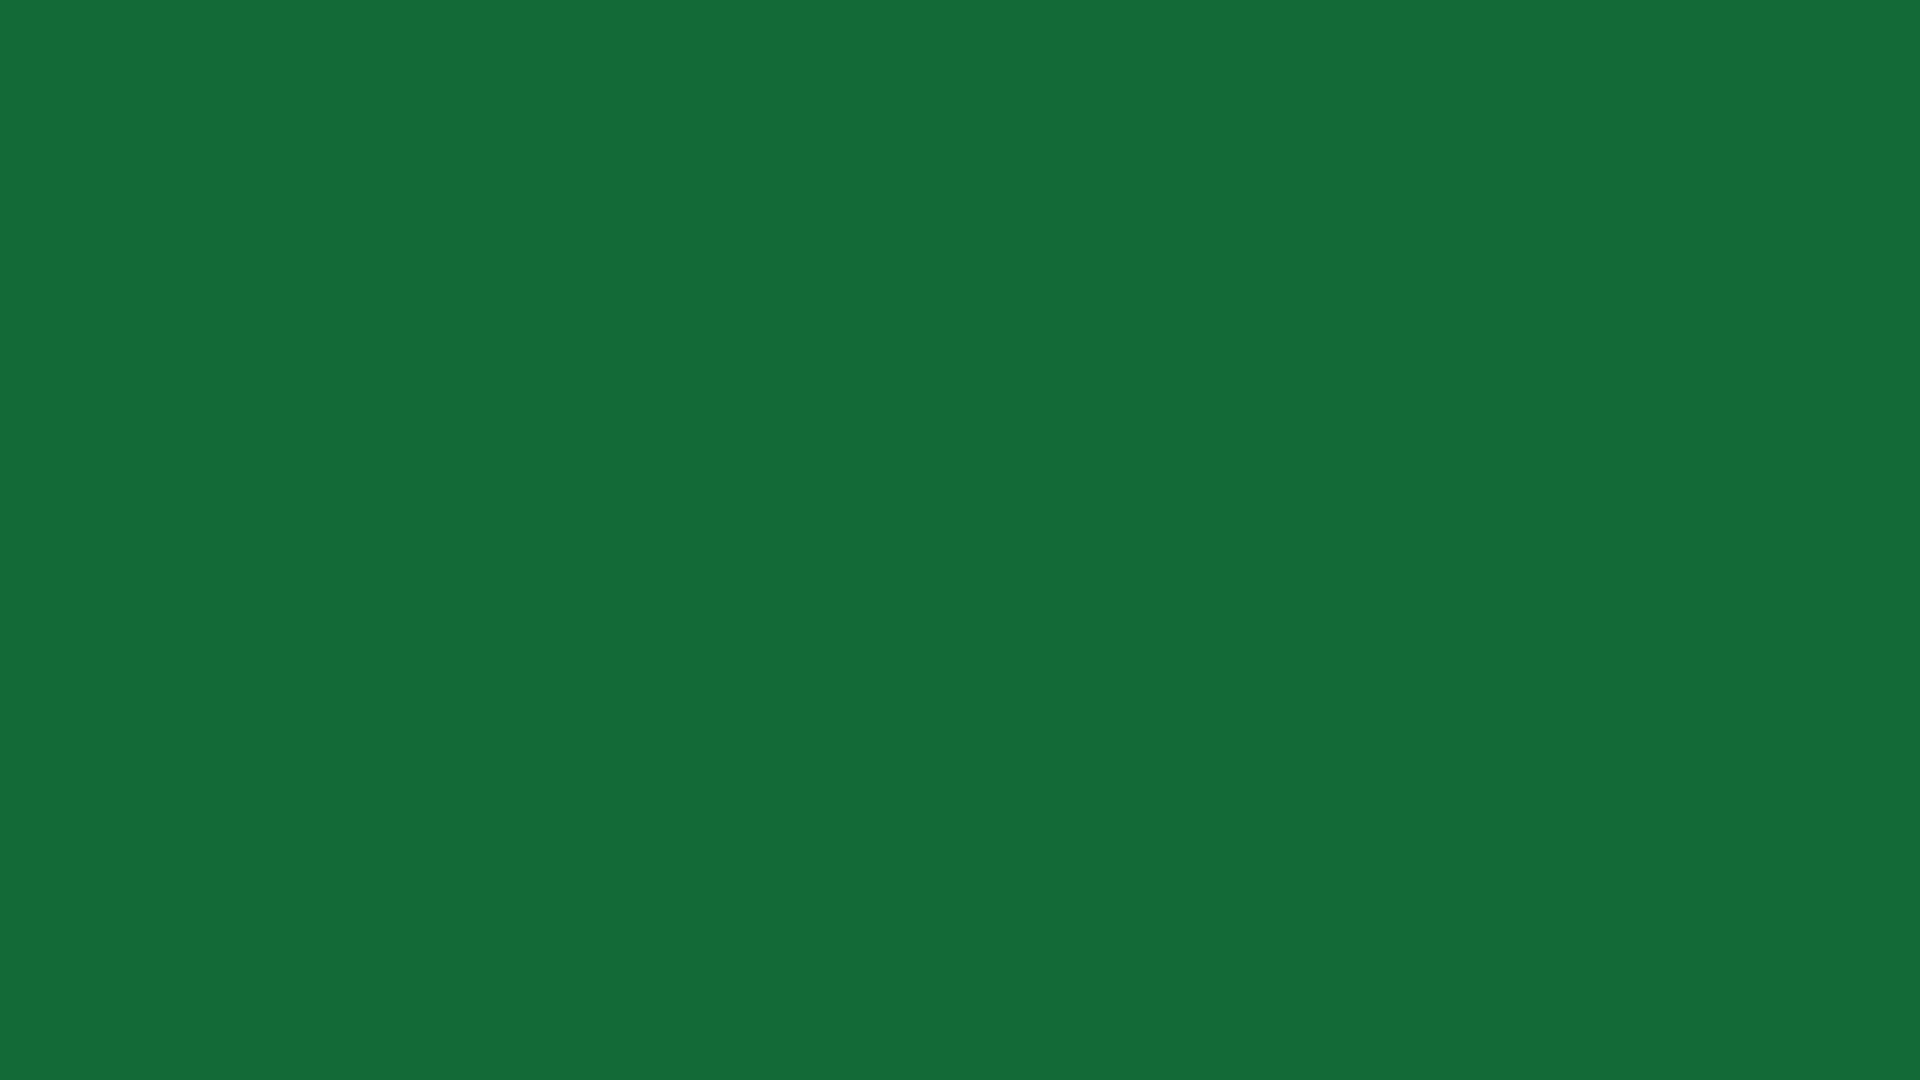 Wingstop Logo Color Scheme Brand and Logo SchemeColorcom 1920x1080